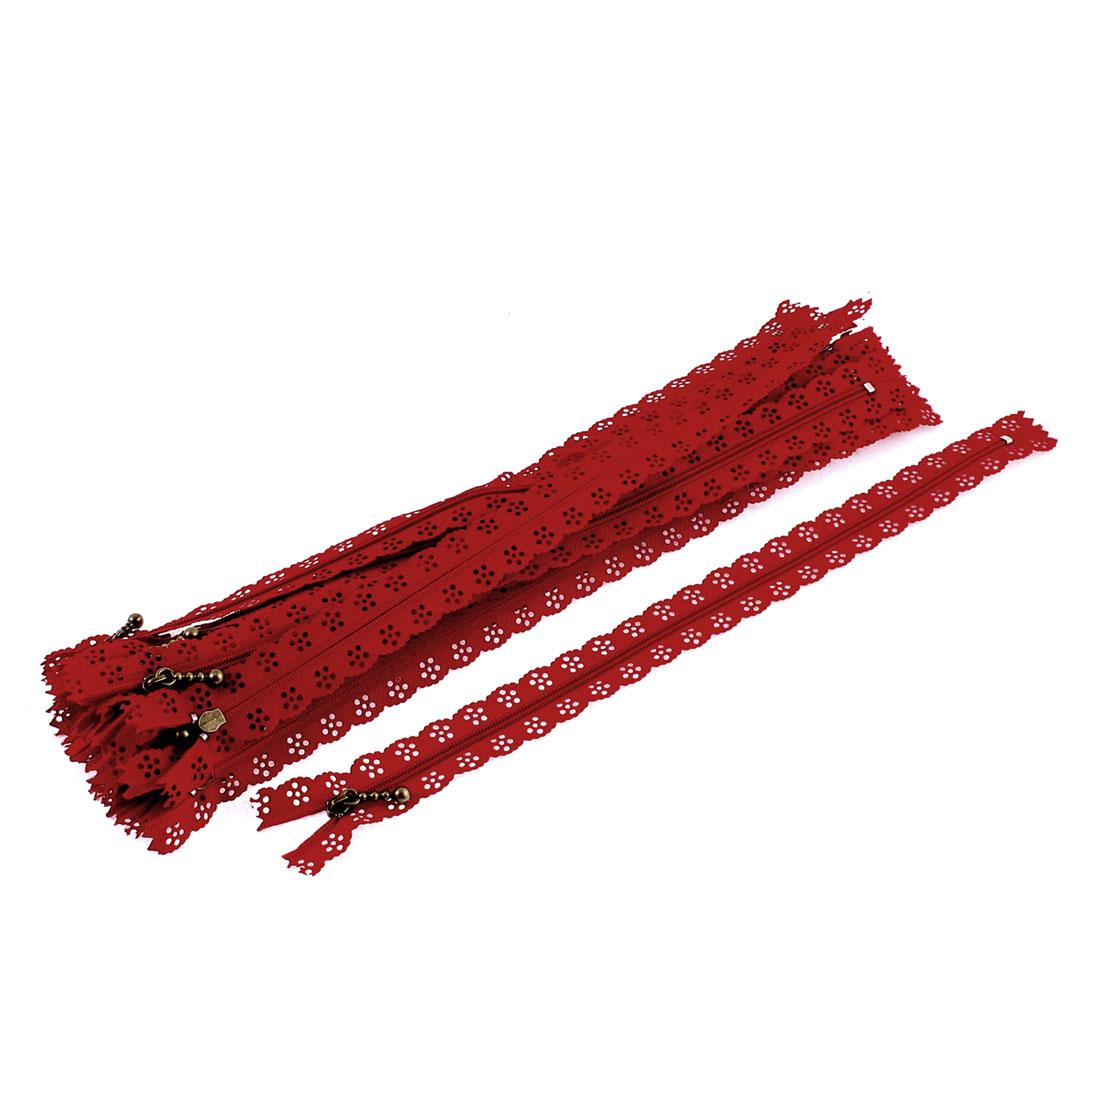 20 Pcs Red Lace Edged Zip Closed End Zipper 30cm Length